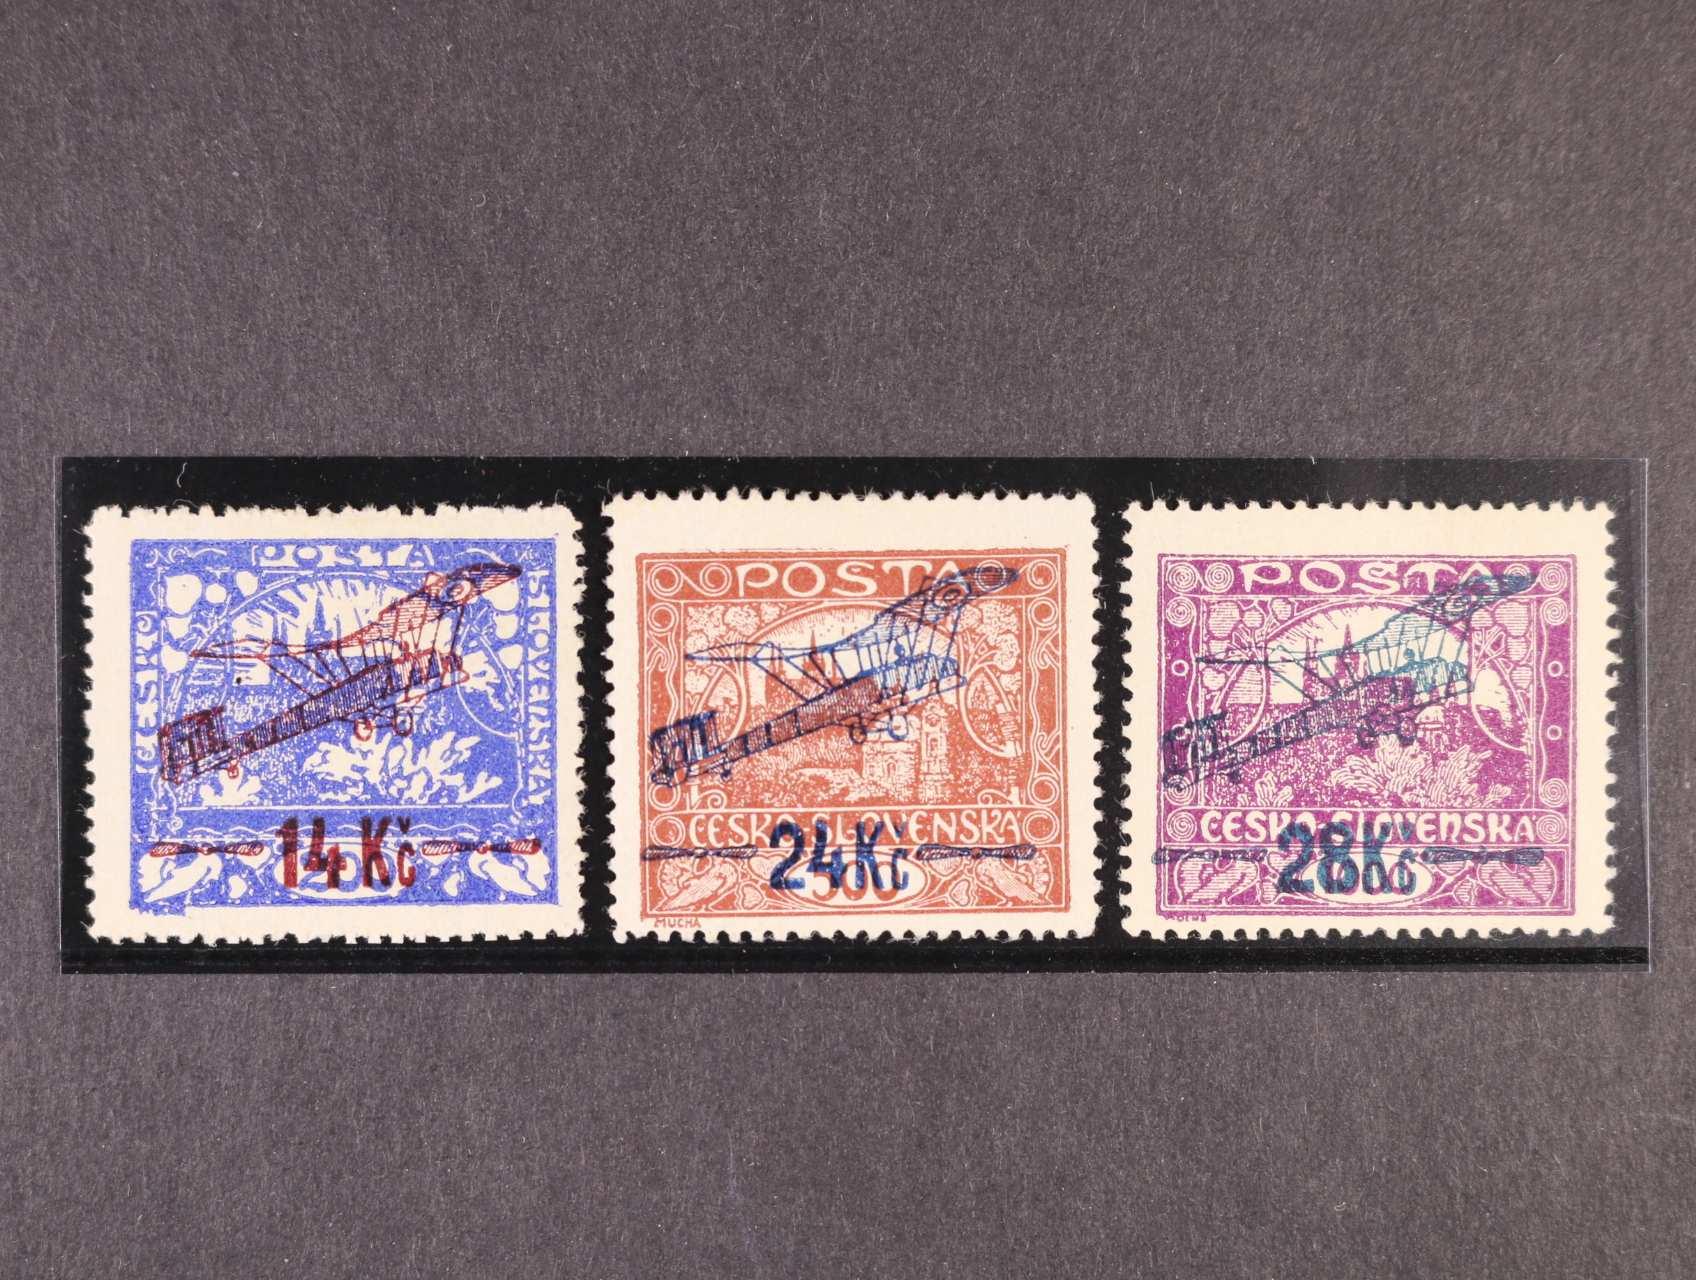 zn. L č. 1 A tmavě ultramarínová, L 2 A, typ II, L 3 B, zk. Gilbert, Karásek, kat. cena 4000 Kč